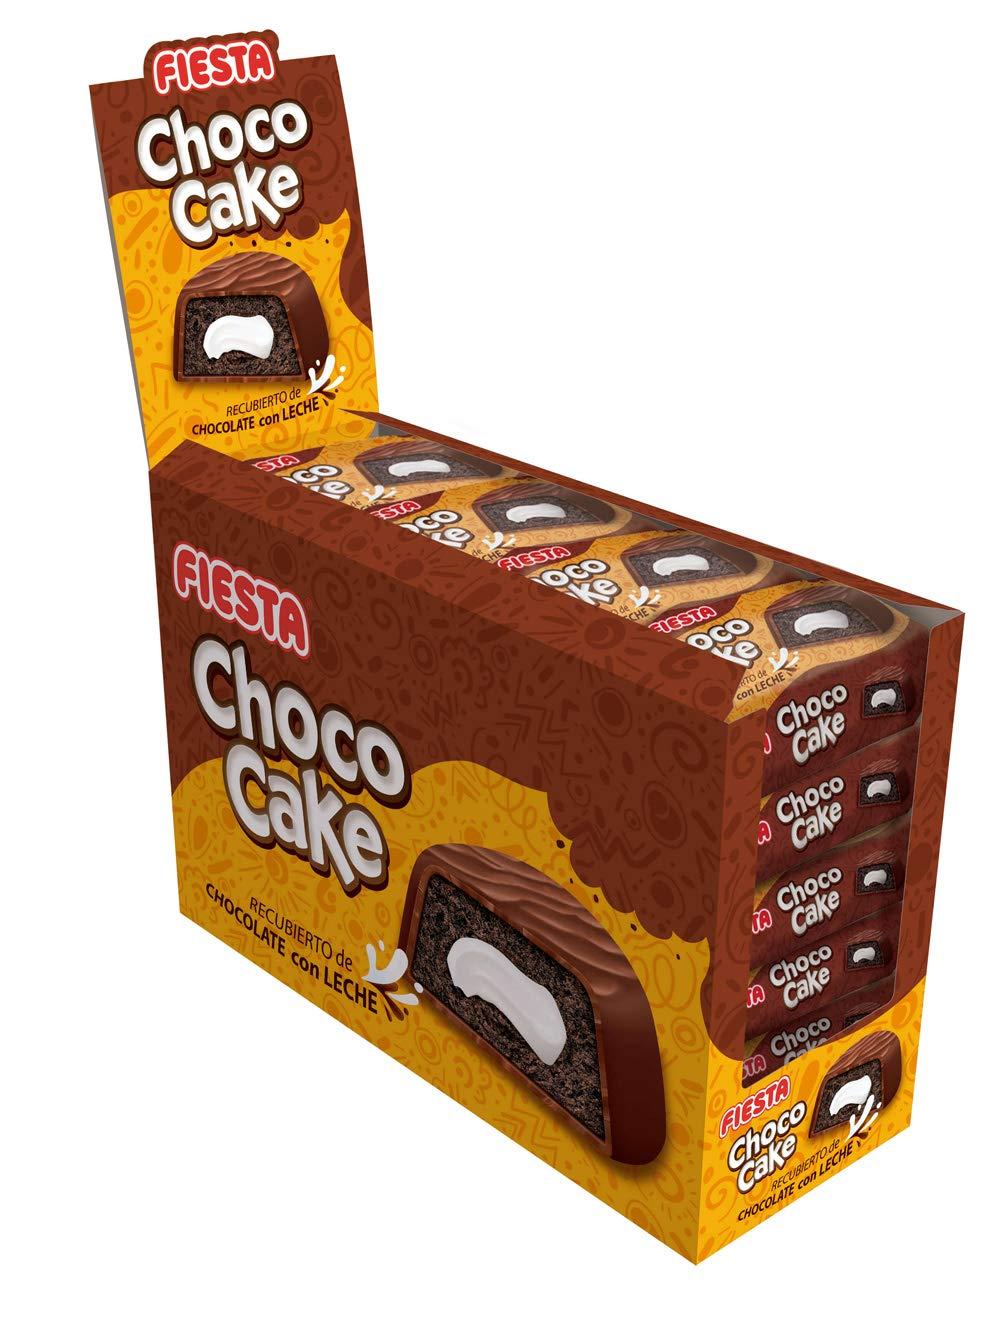 FIESTA Choco Cake Bizcocho esponjoso recubierto de chocolate ...